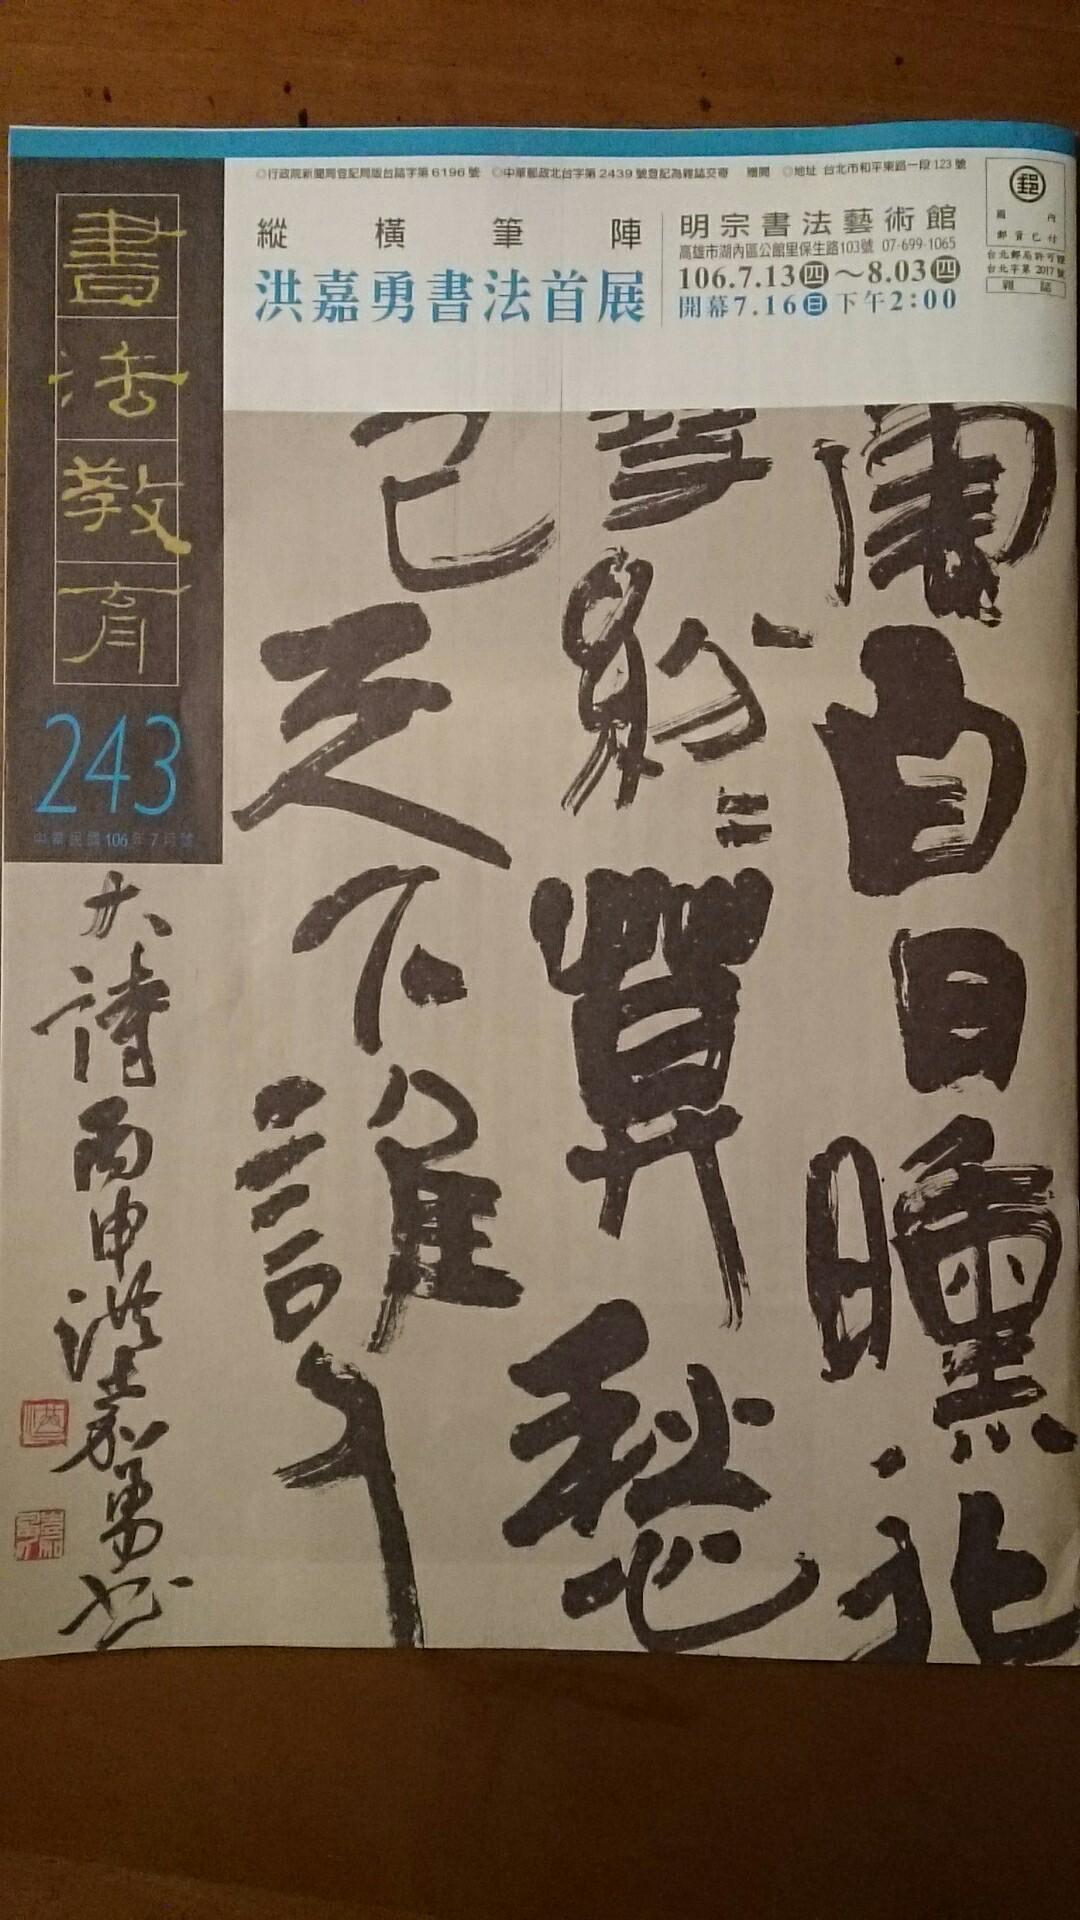 20170708 150448[1]